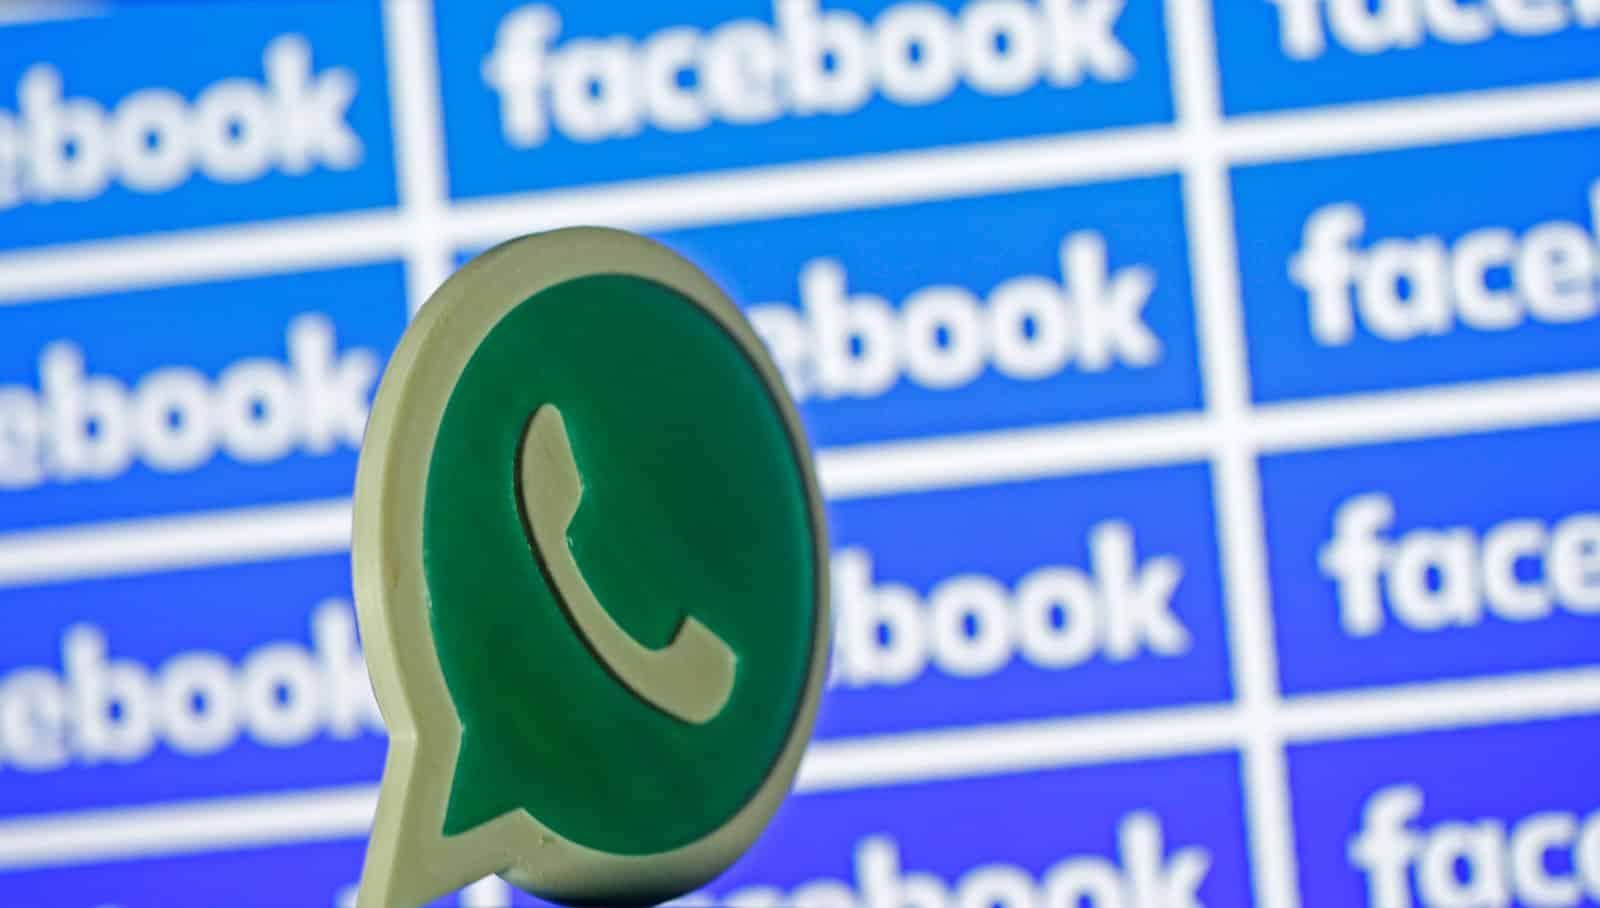 WhatsApp الواقع يرغم واتساب للتخلص من أكبر مبادئه: كراهية الإعلانات